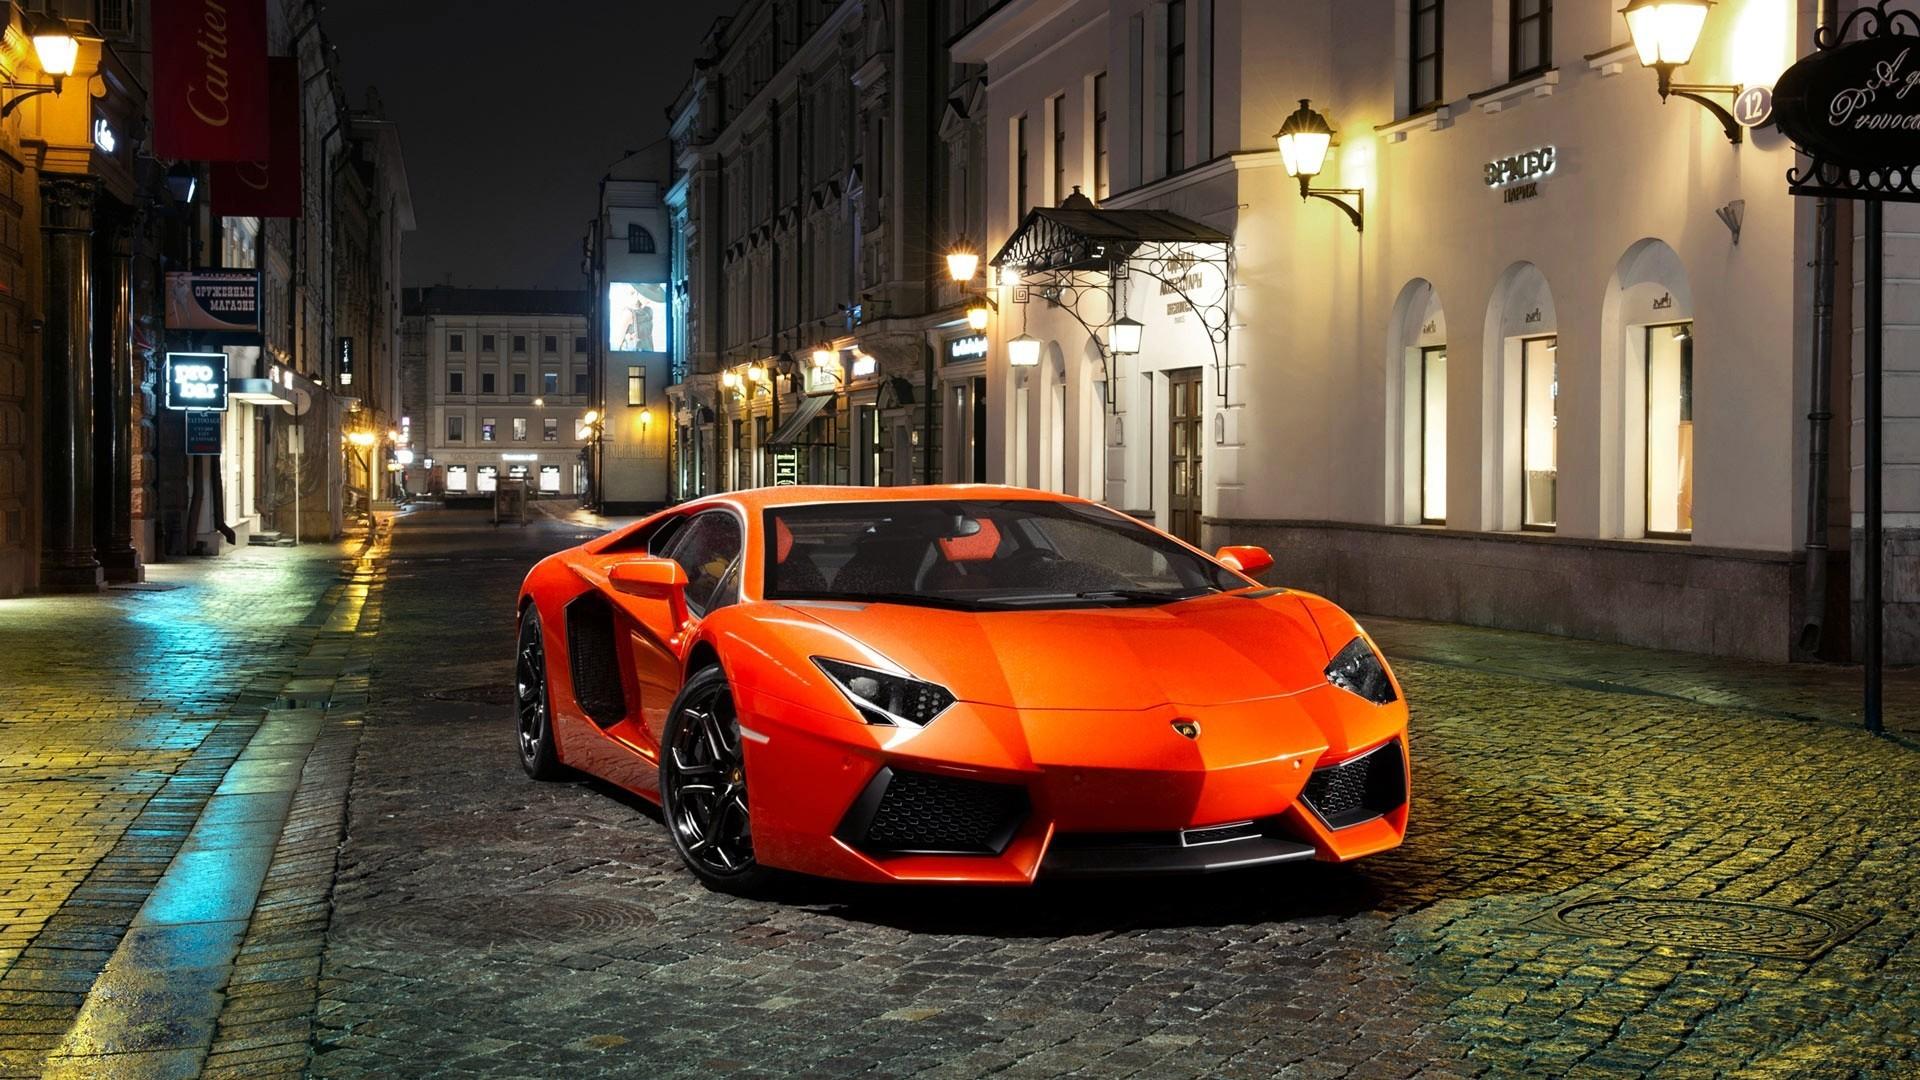 Orange Lamborghini Evening On An Empty Street With City Wallpaper